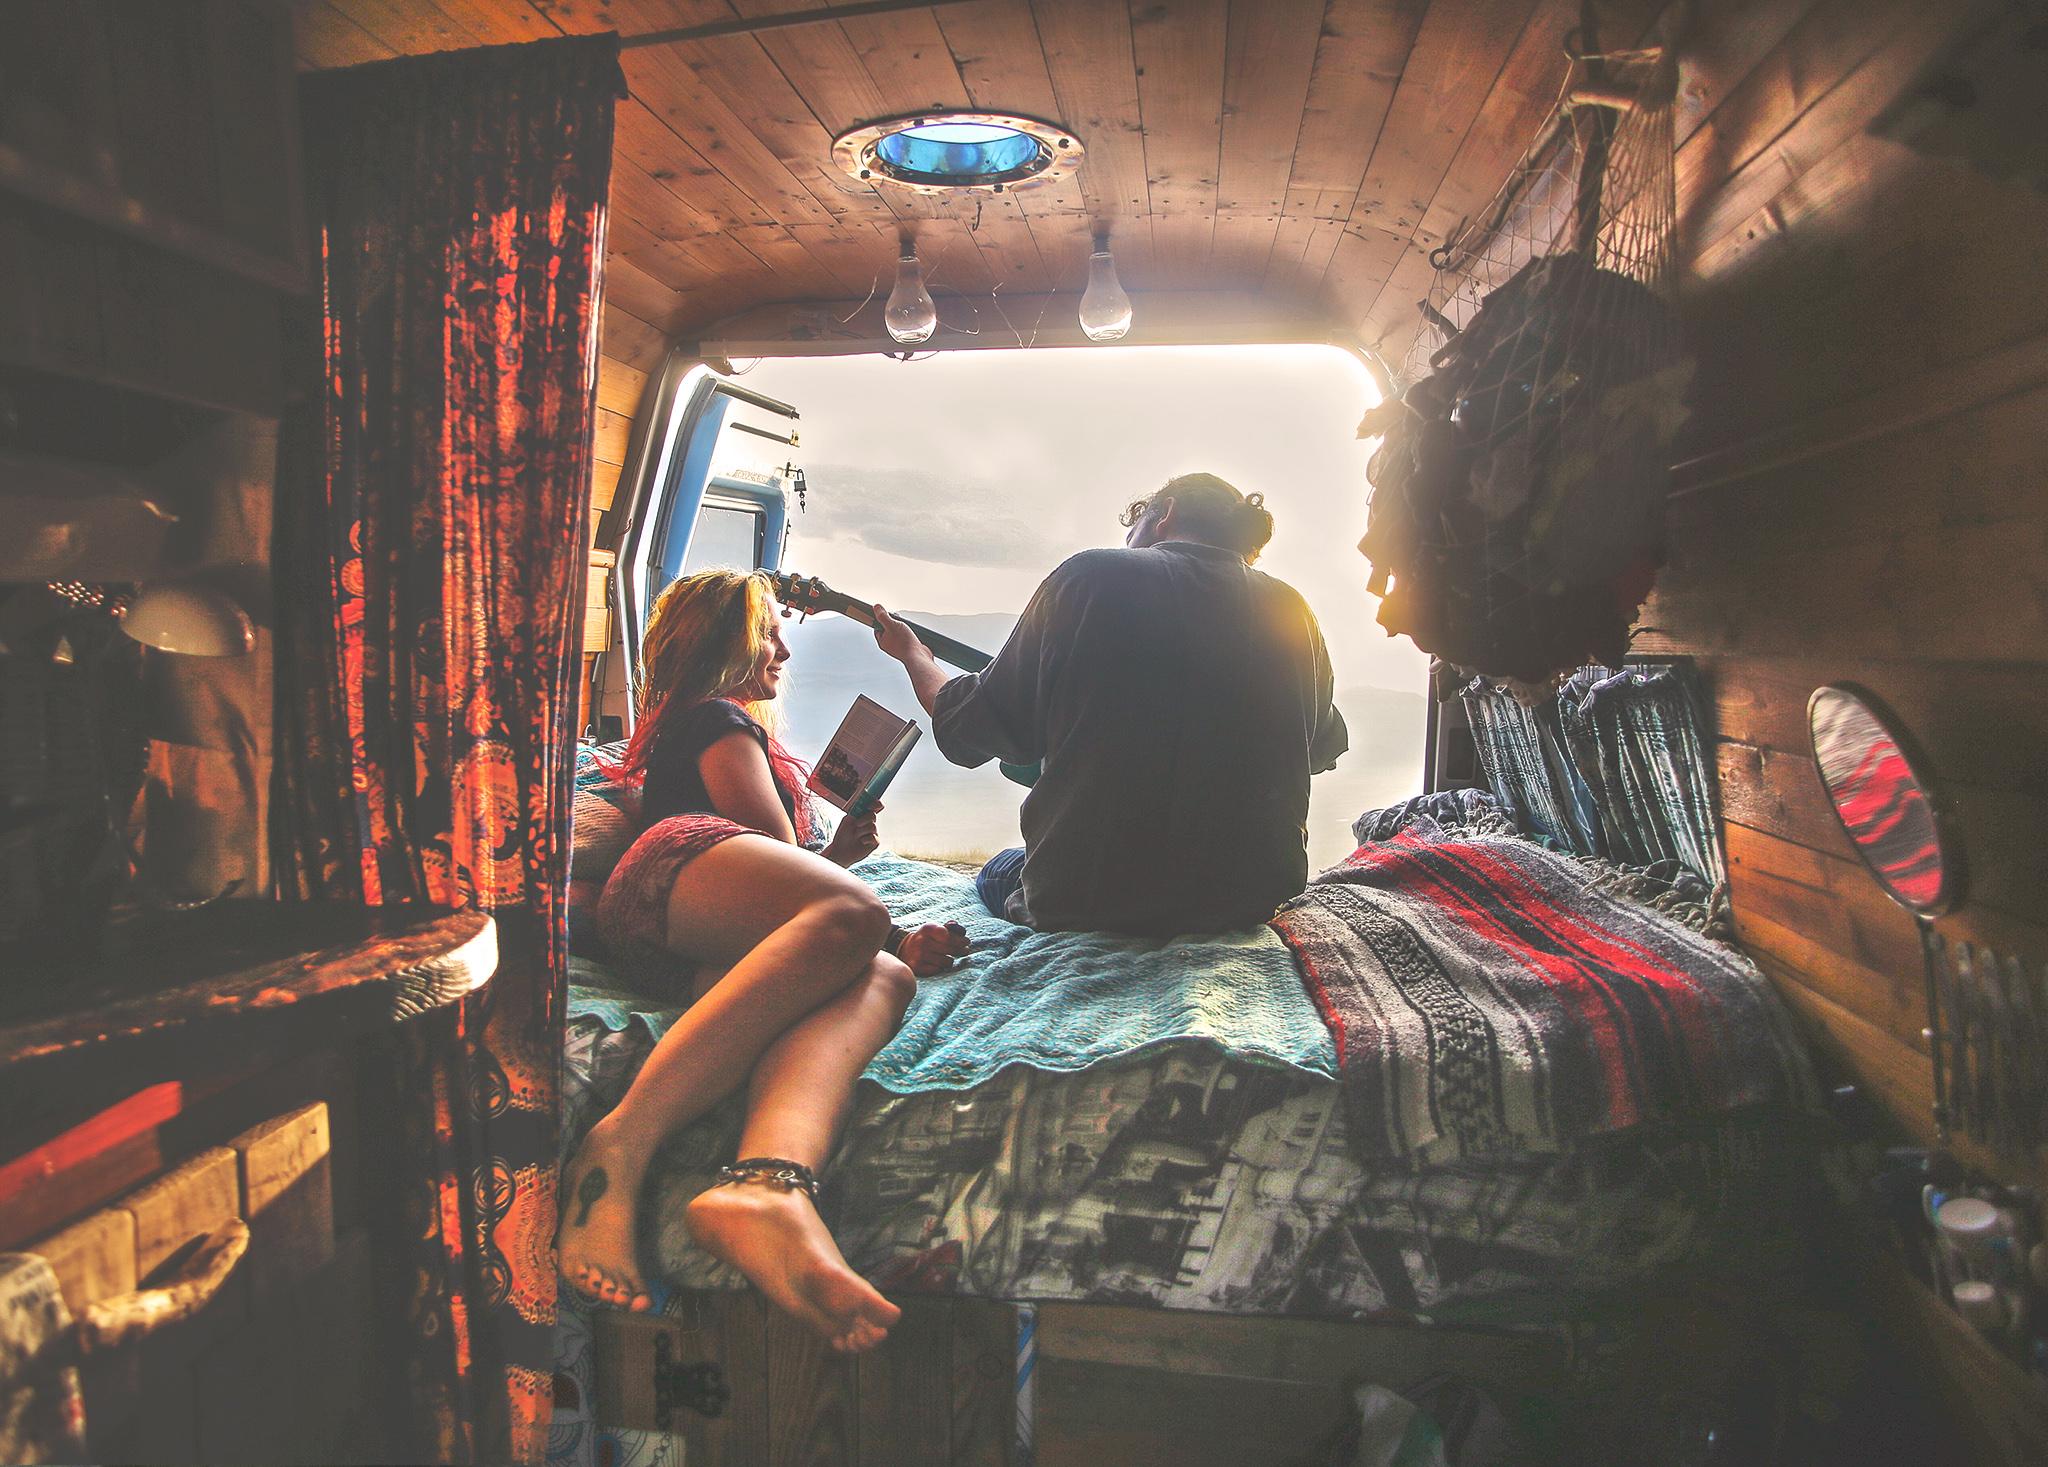 Playing Guitar in Van